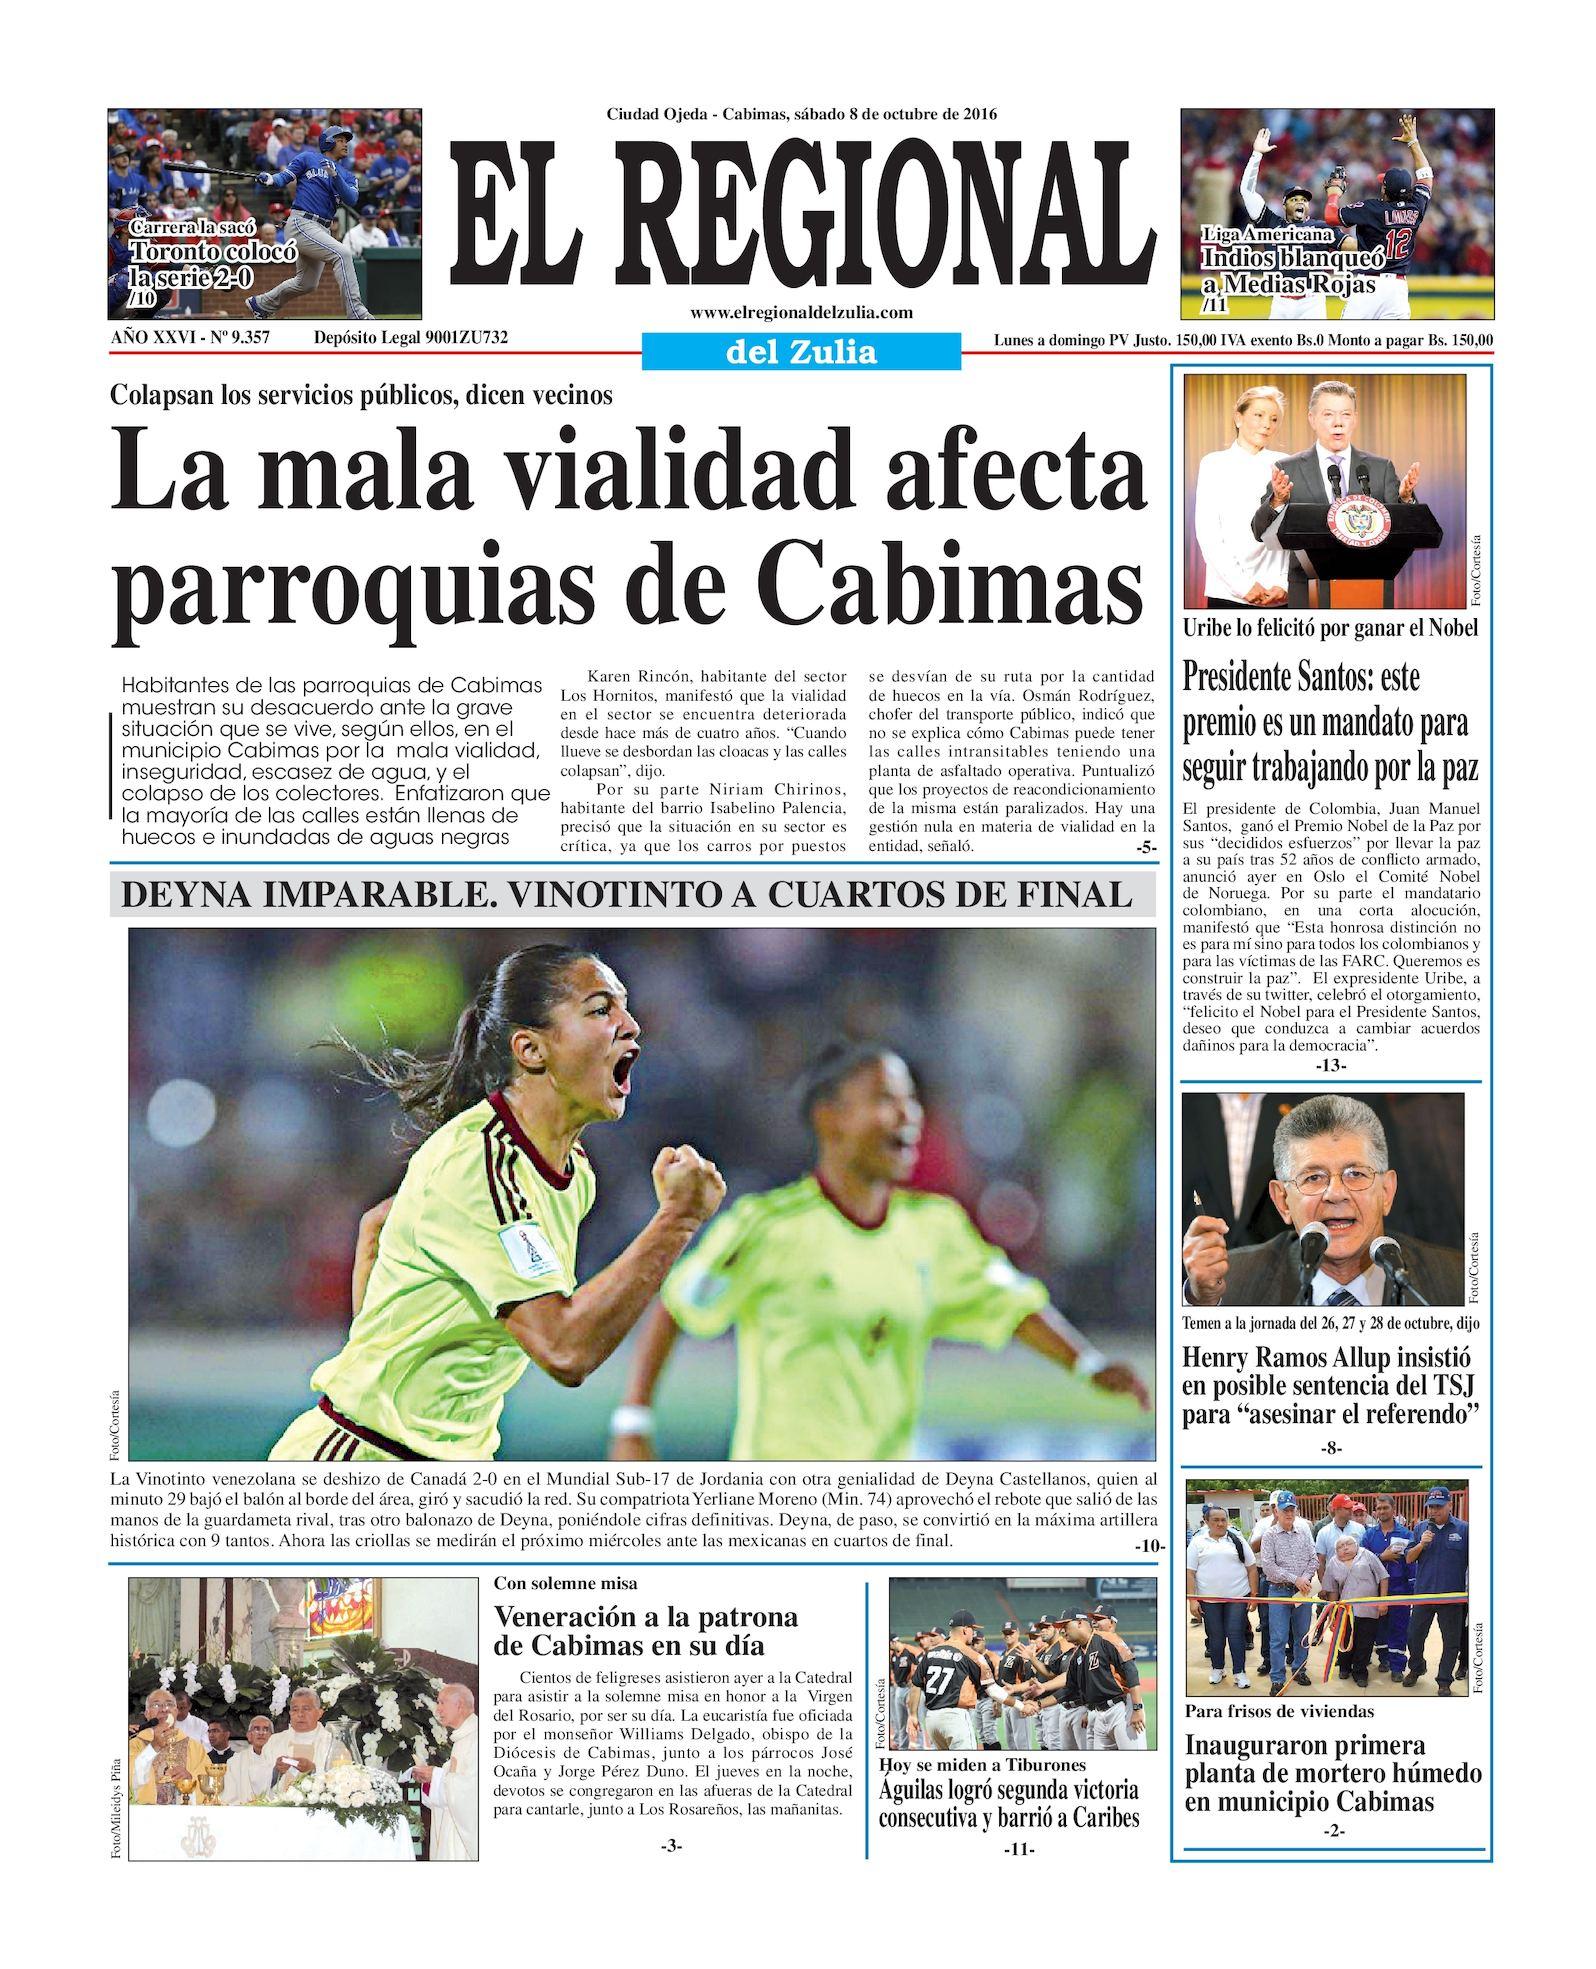 Calaméo - El Regional del Zulia 08-10-2016